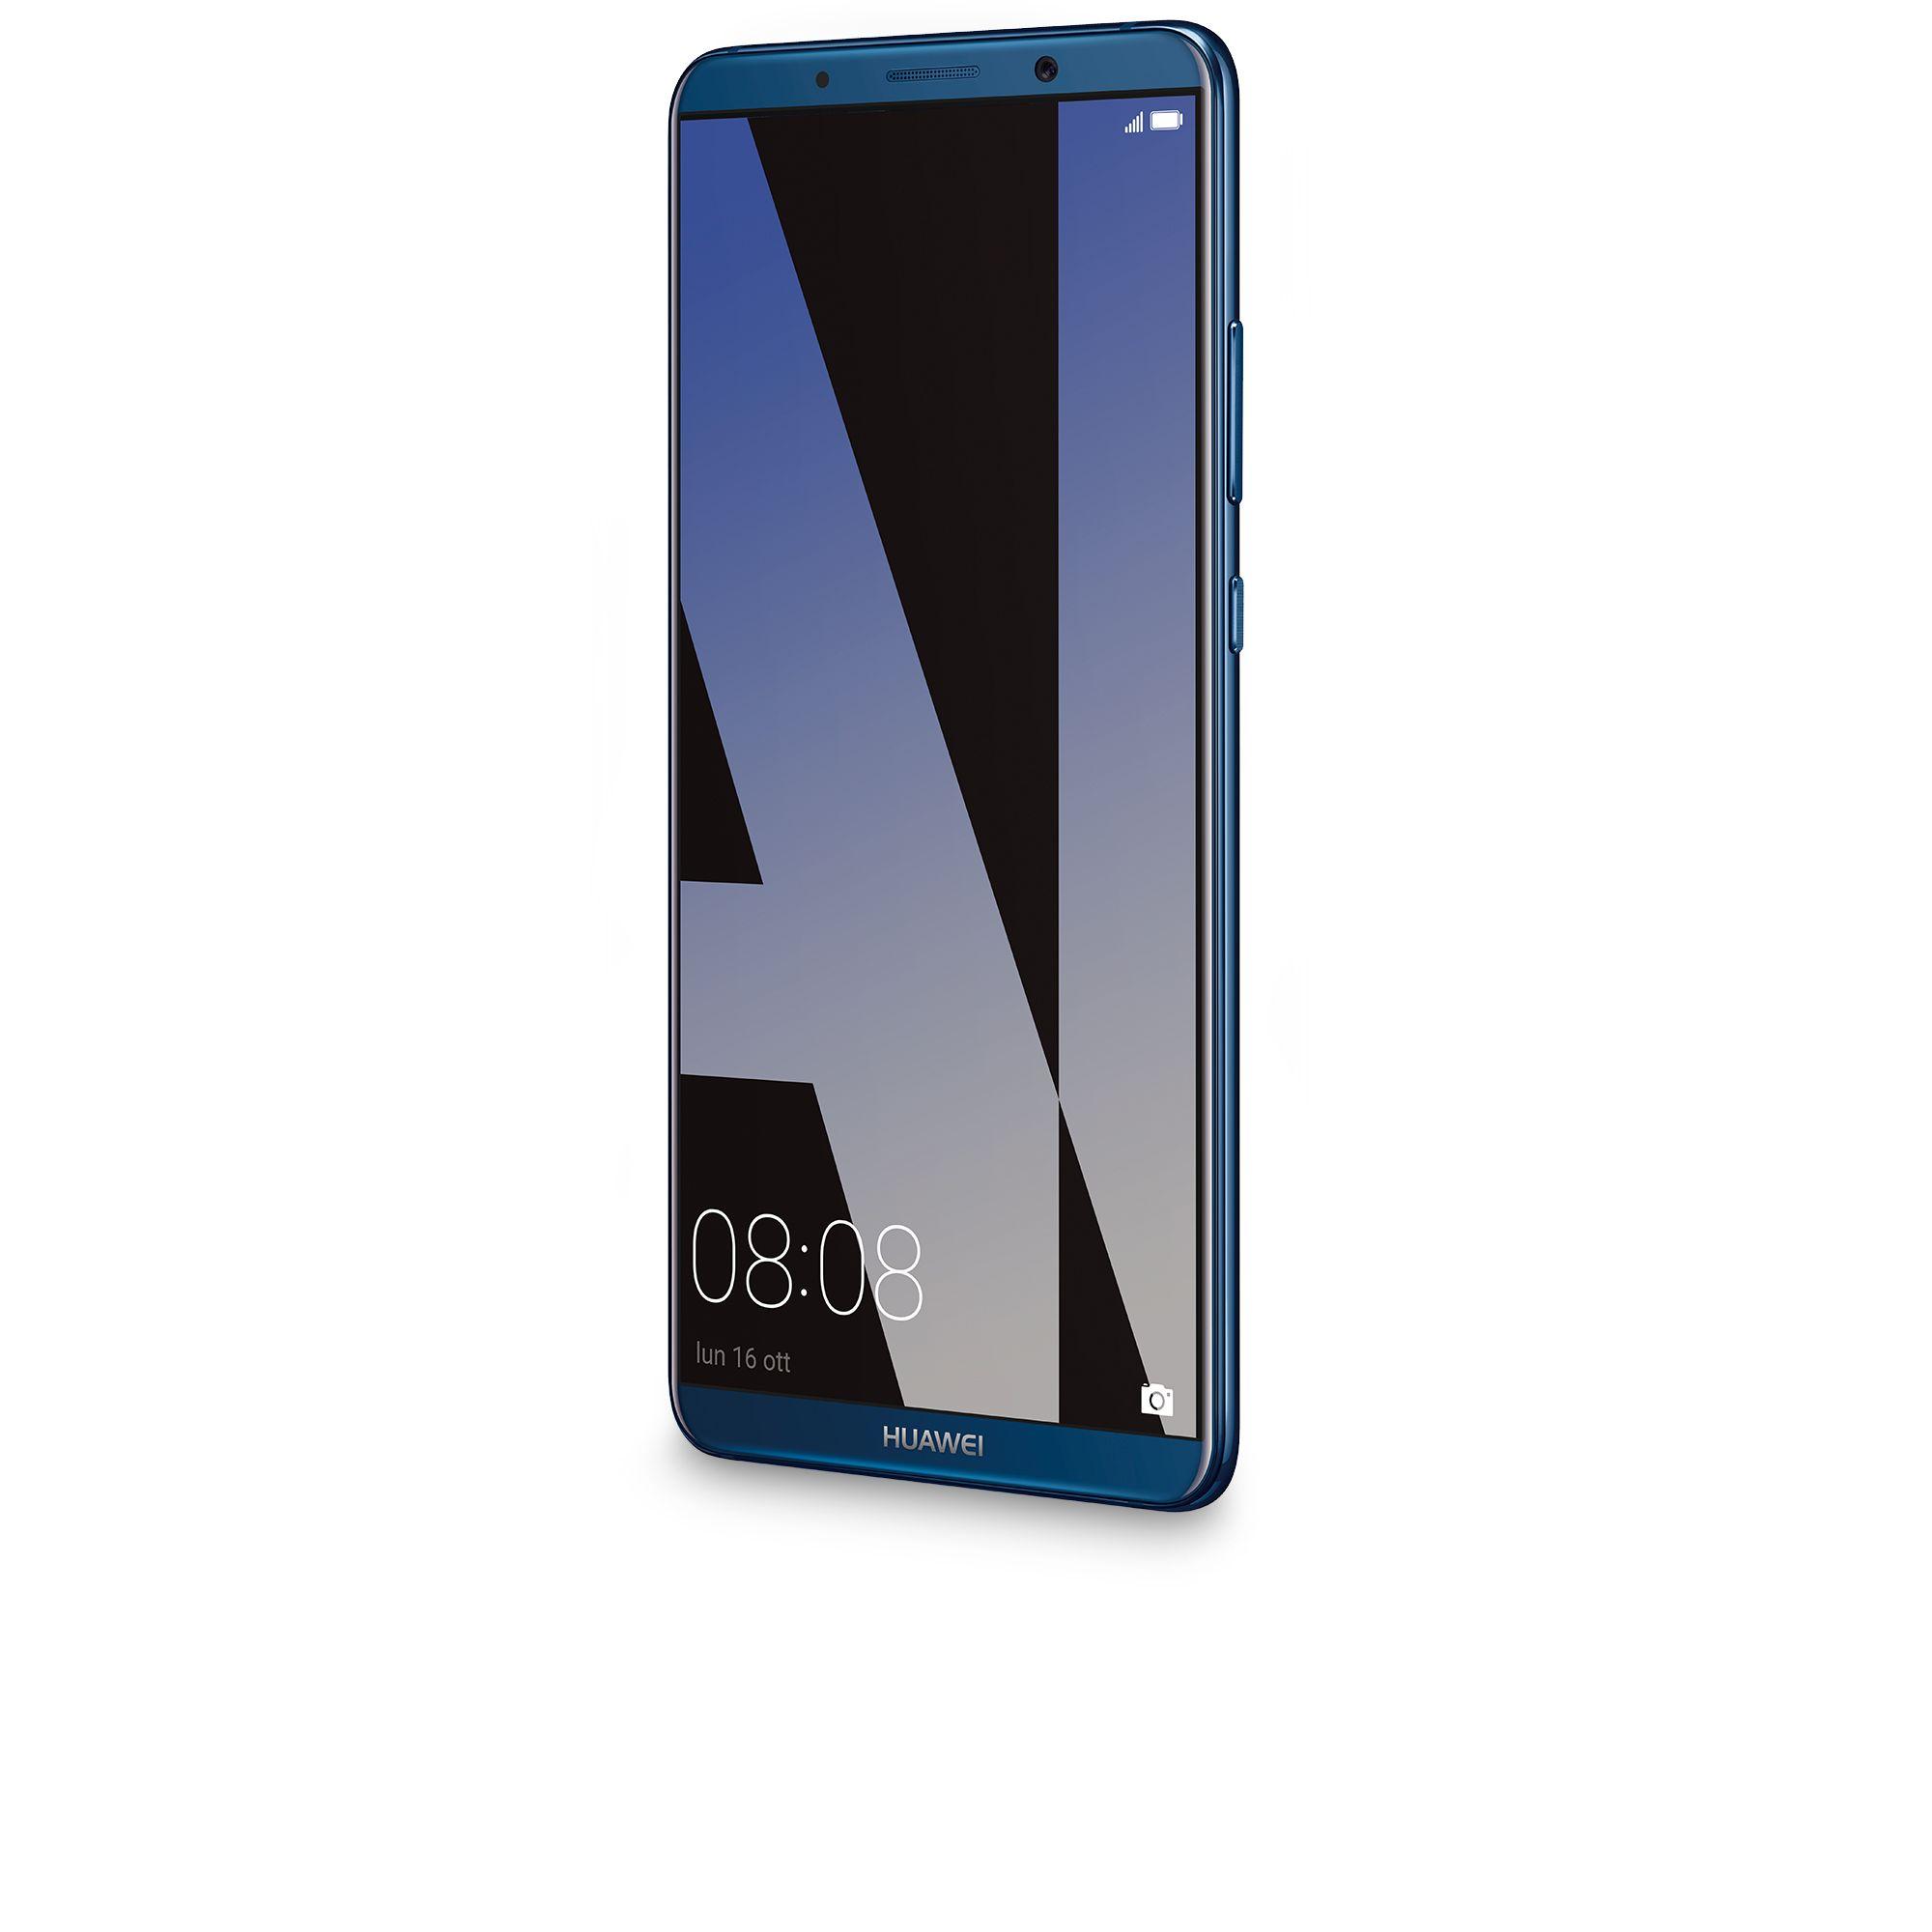 Huawei Mate10 Pro Smartphone 4G LTE 6